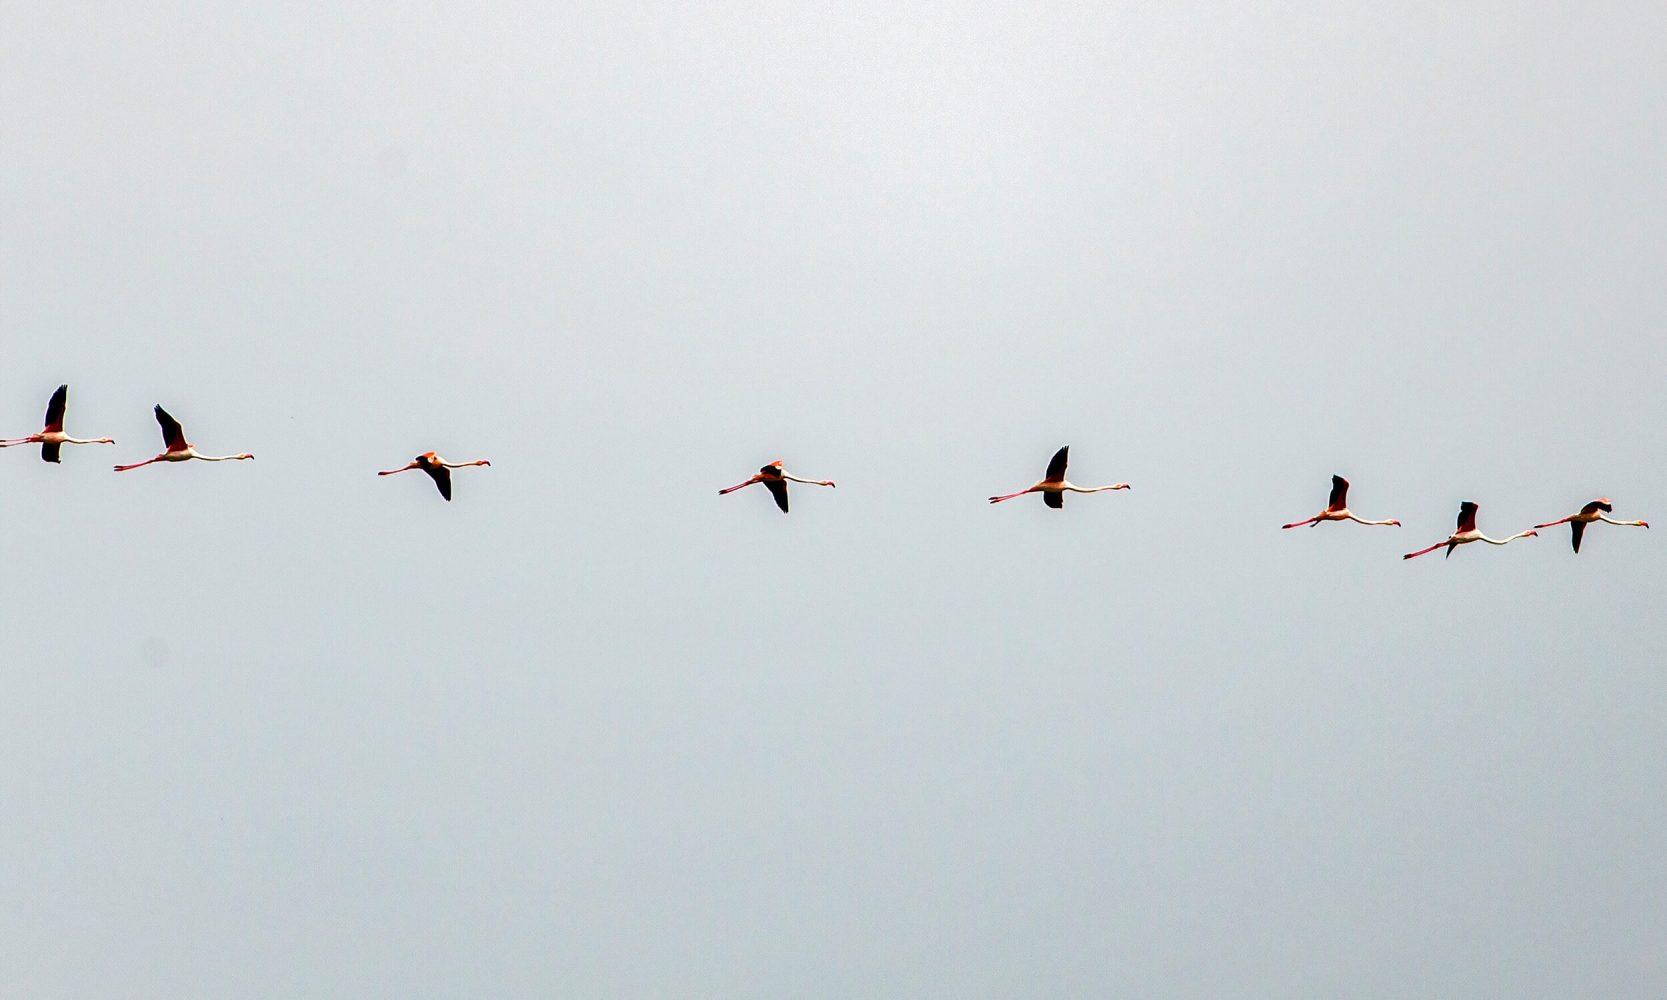 flamingo formation in sky